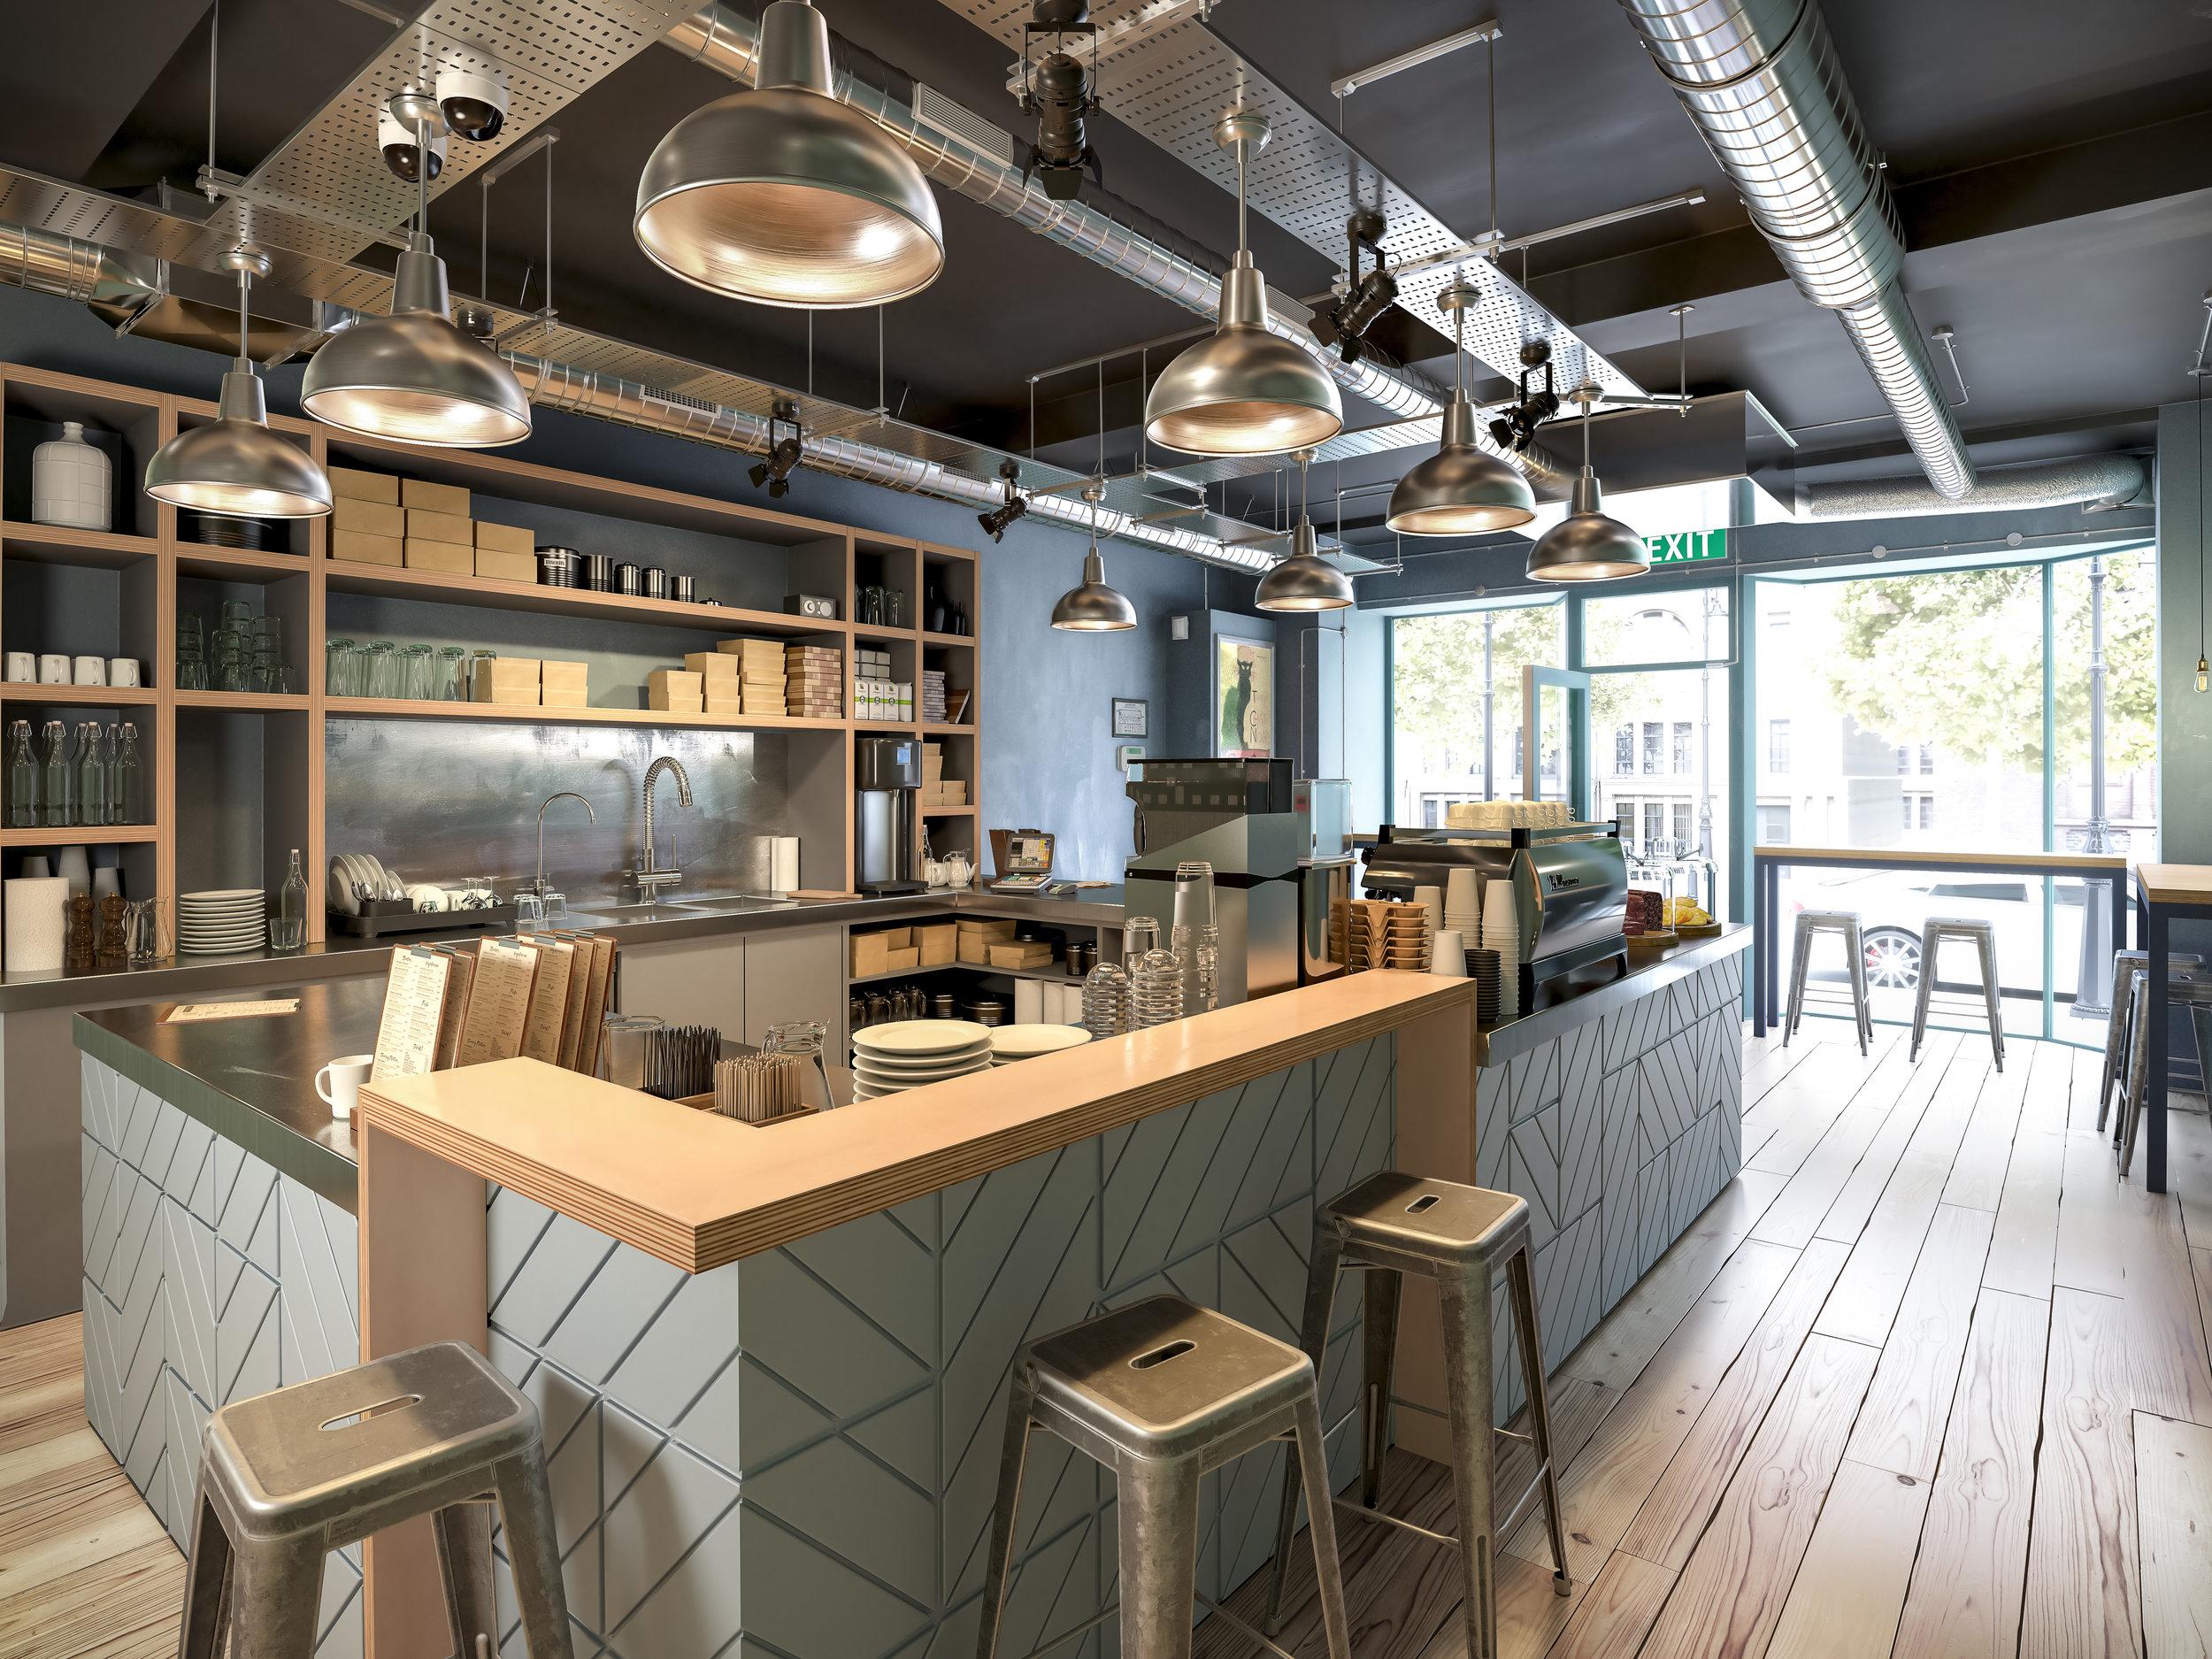 1001_Cafe.jpg